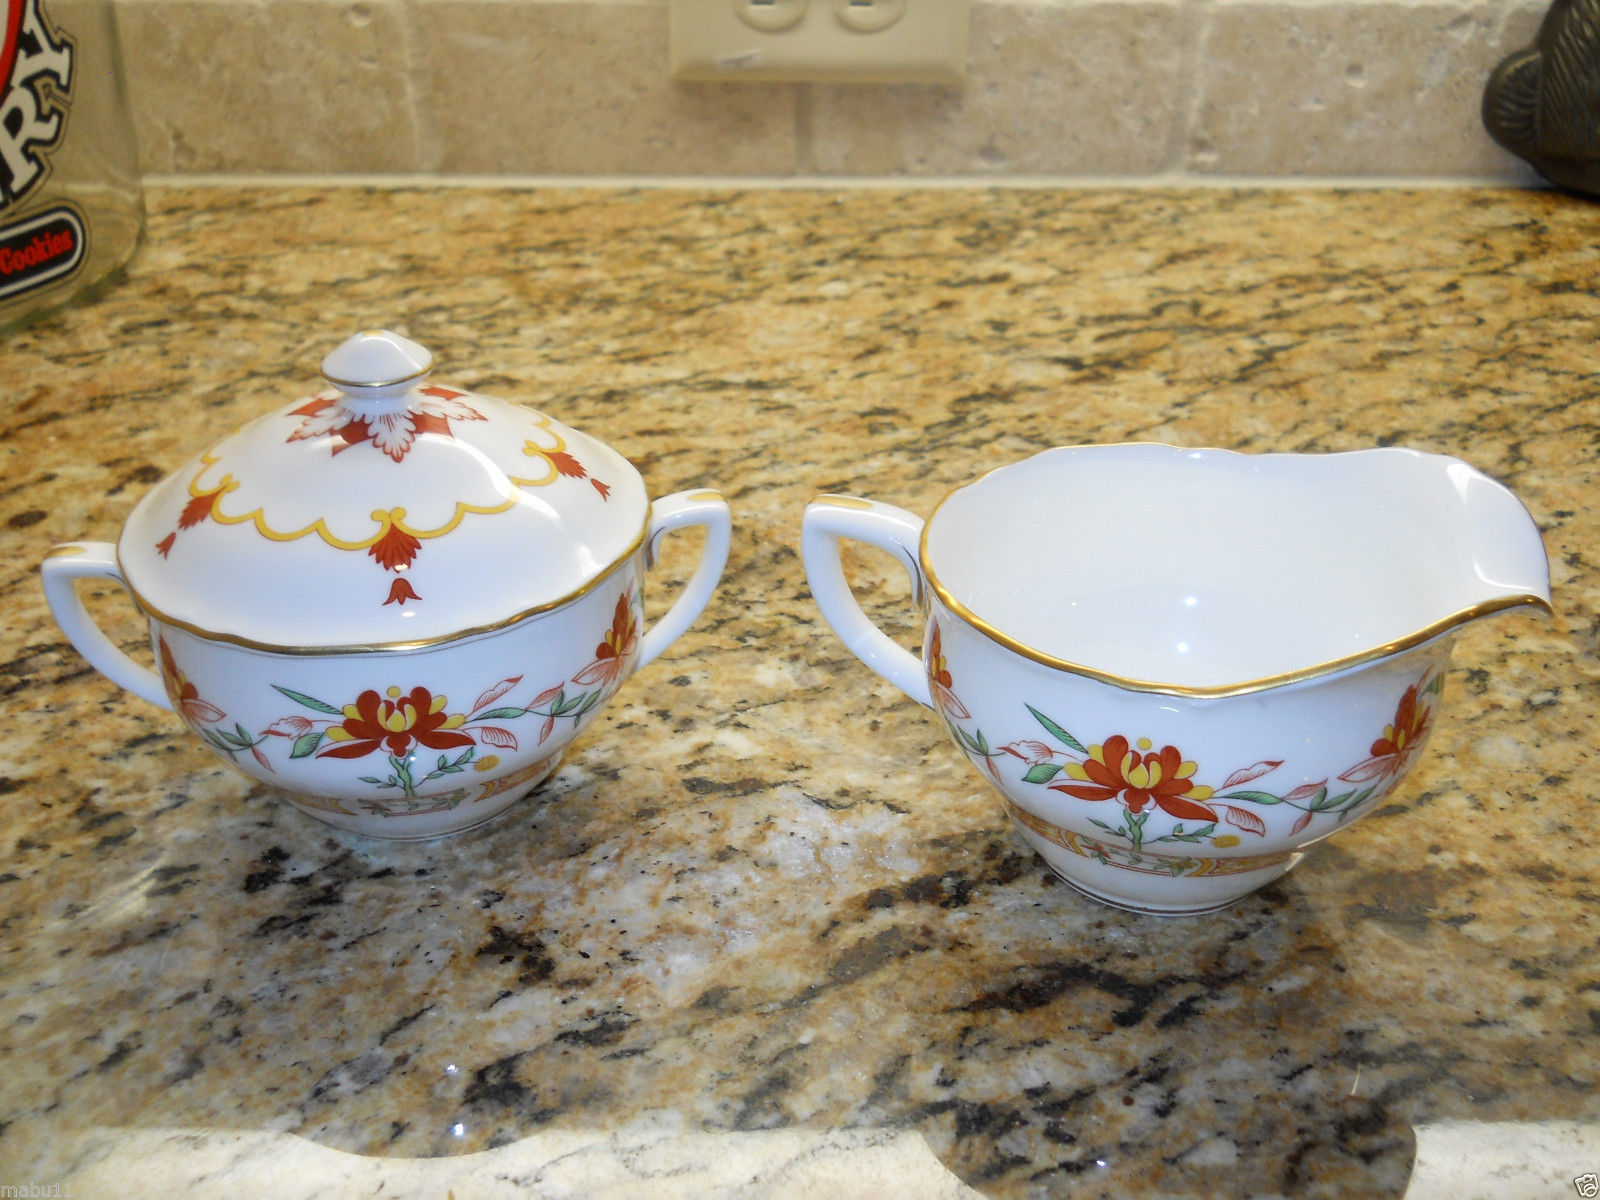 Royal Worcester Chamberlain Orange Sugar Bowl and Creamer set